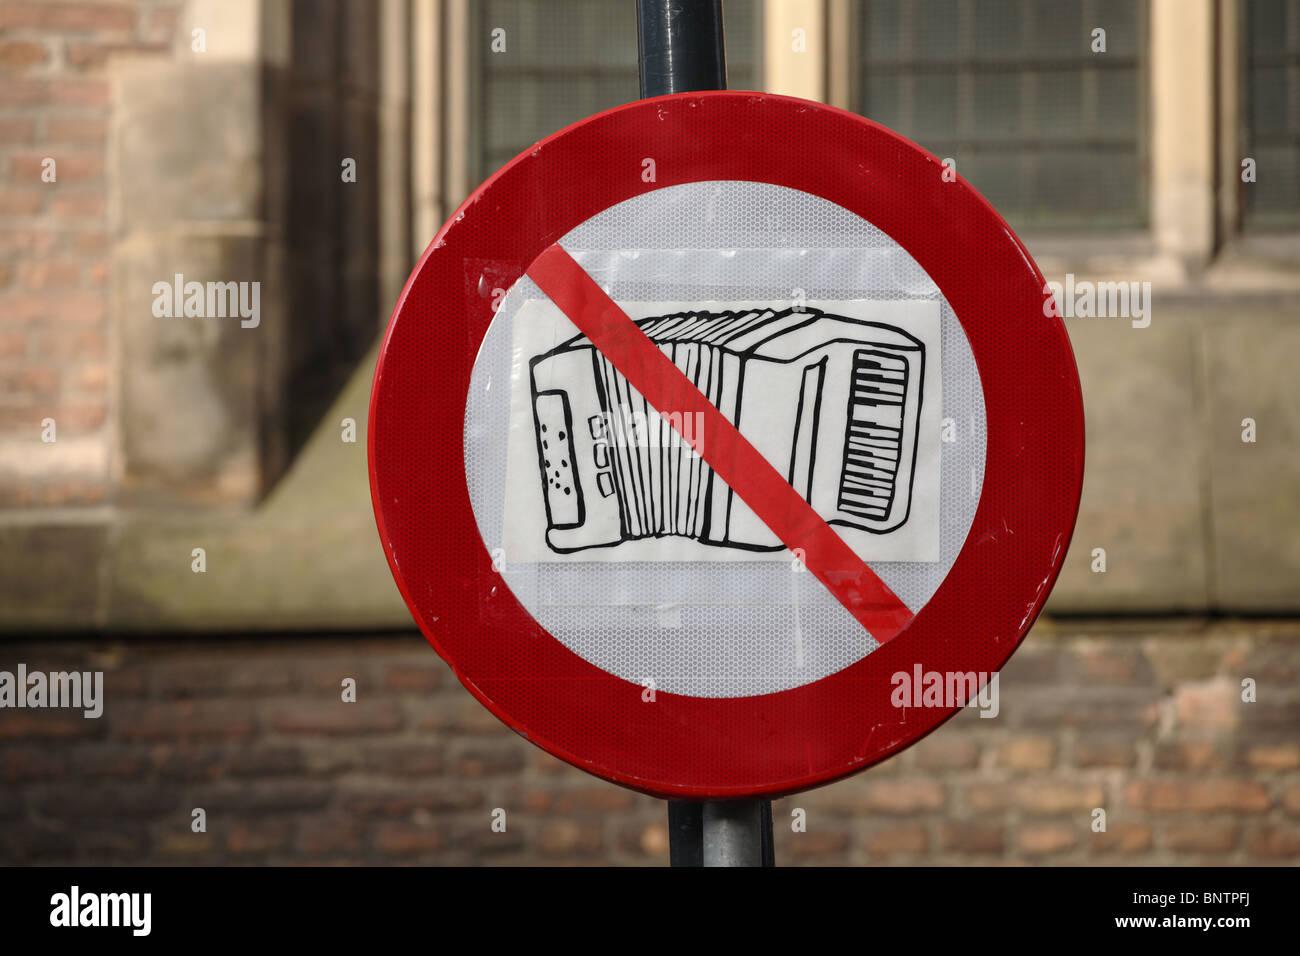 a-sign-banning-the-playing-of-music-outside-the-saint-bavokerk-church-BNTPFJ.jpg